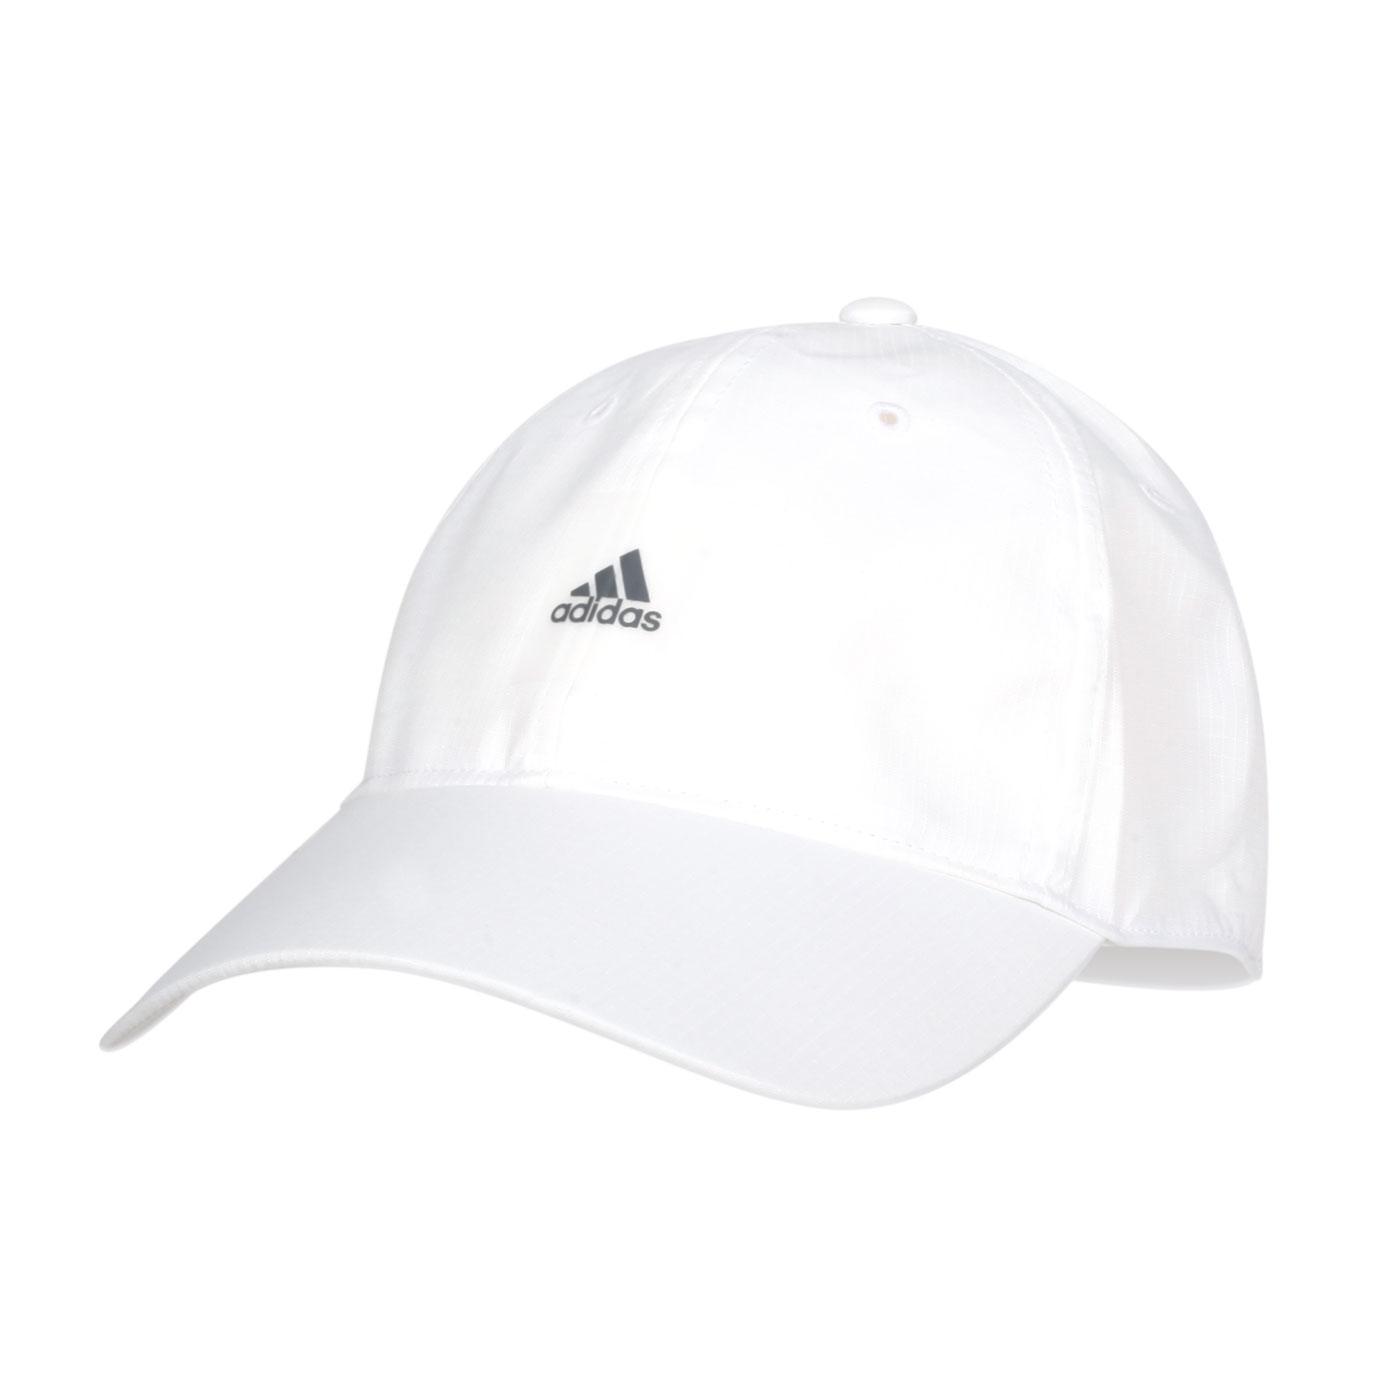 ADIDAS 帽子 GN2003 - 白黑